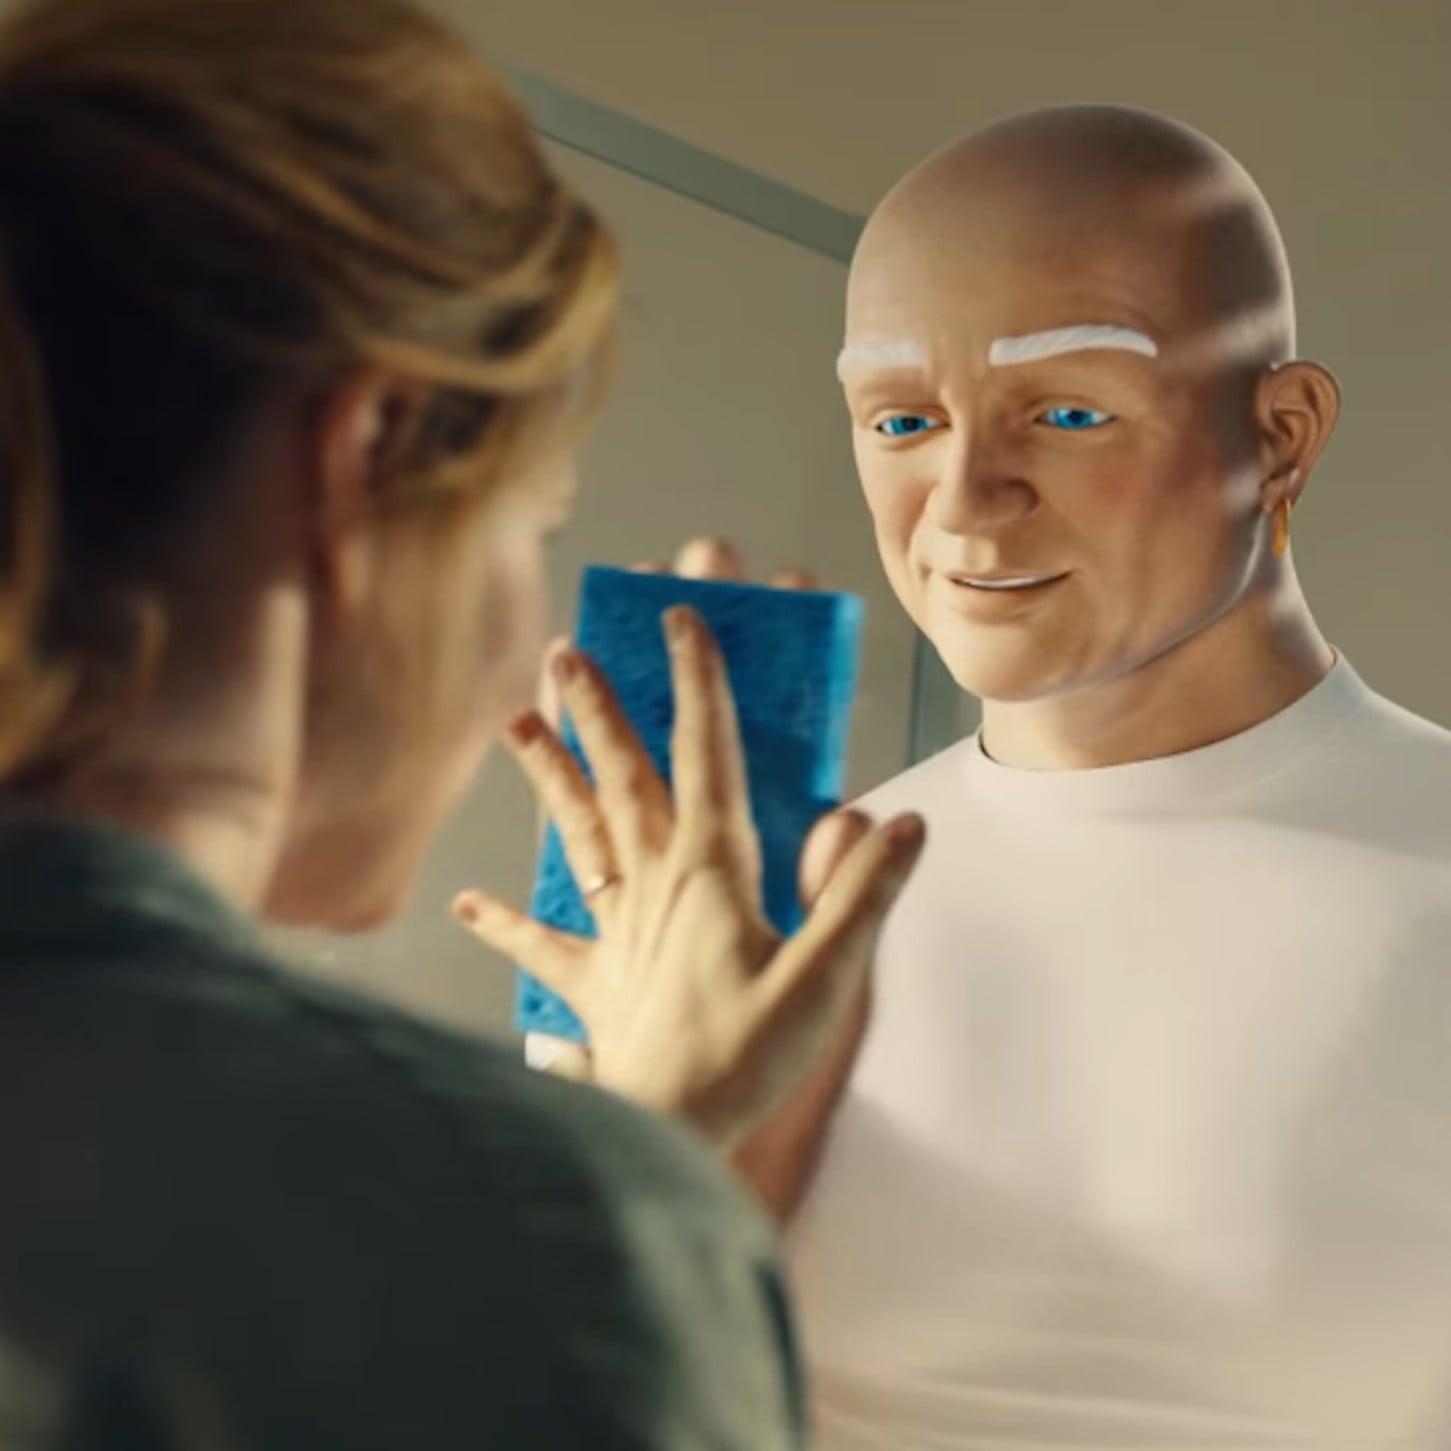 mr clean super bowl commercial memes popsugar love sex